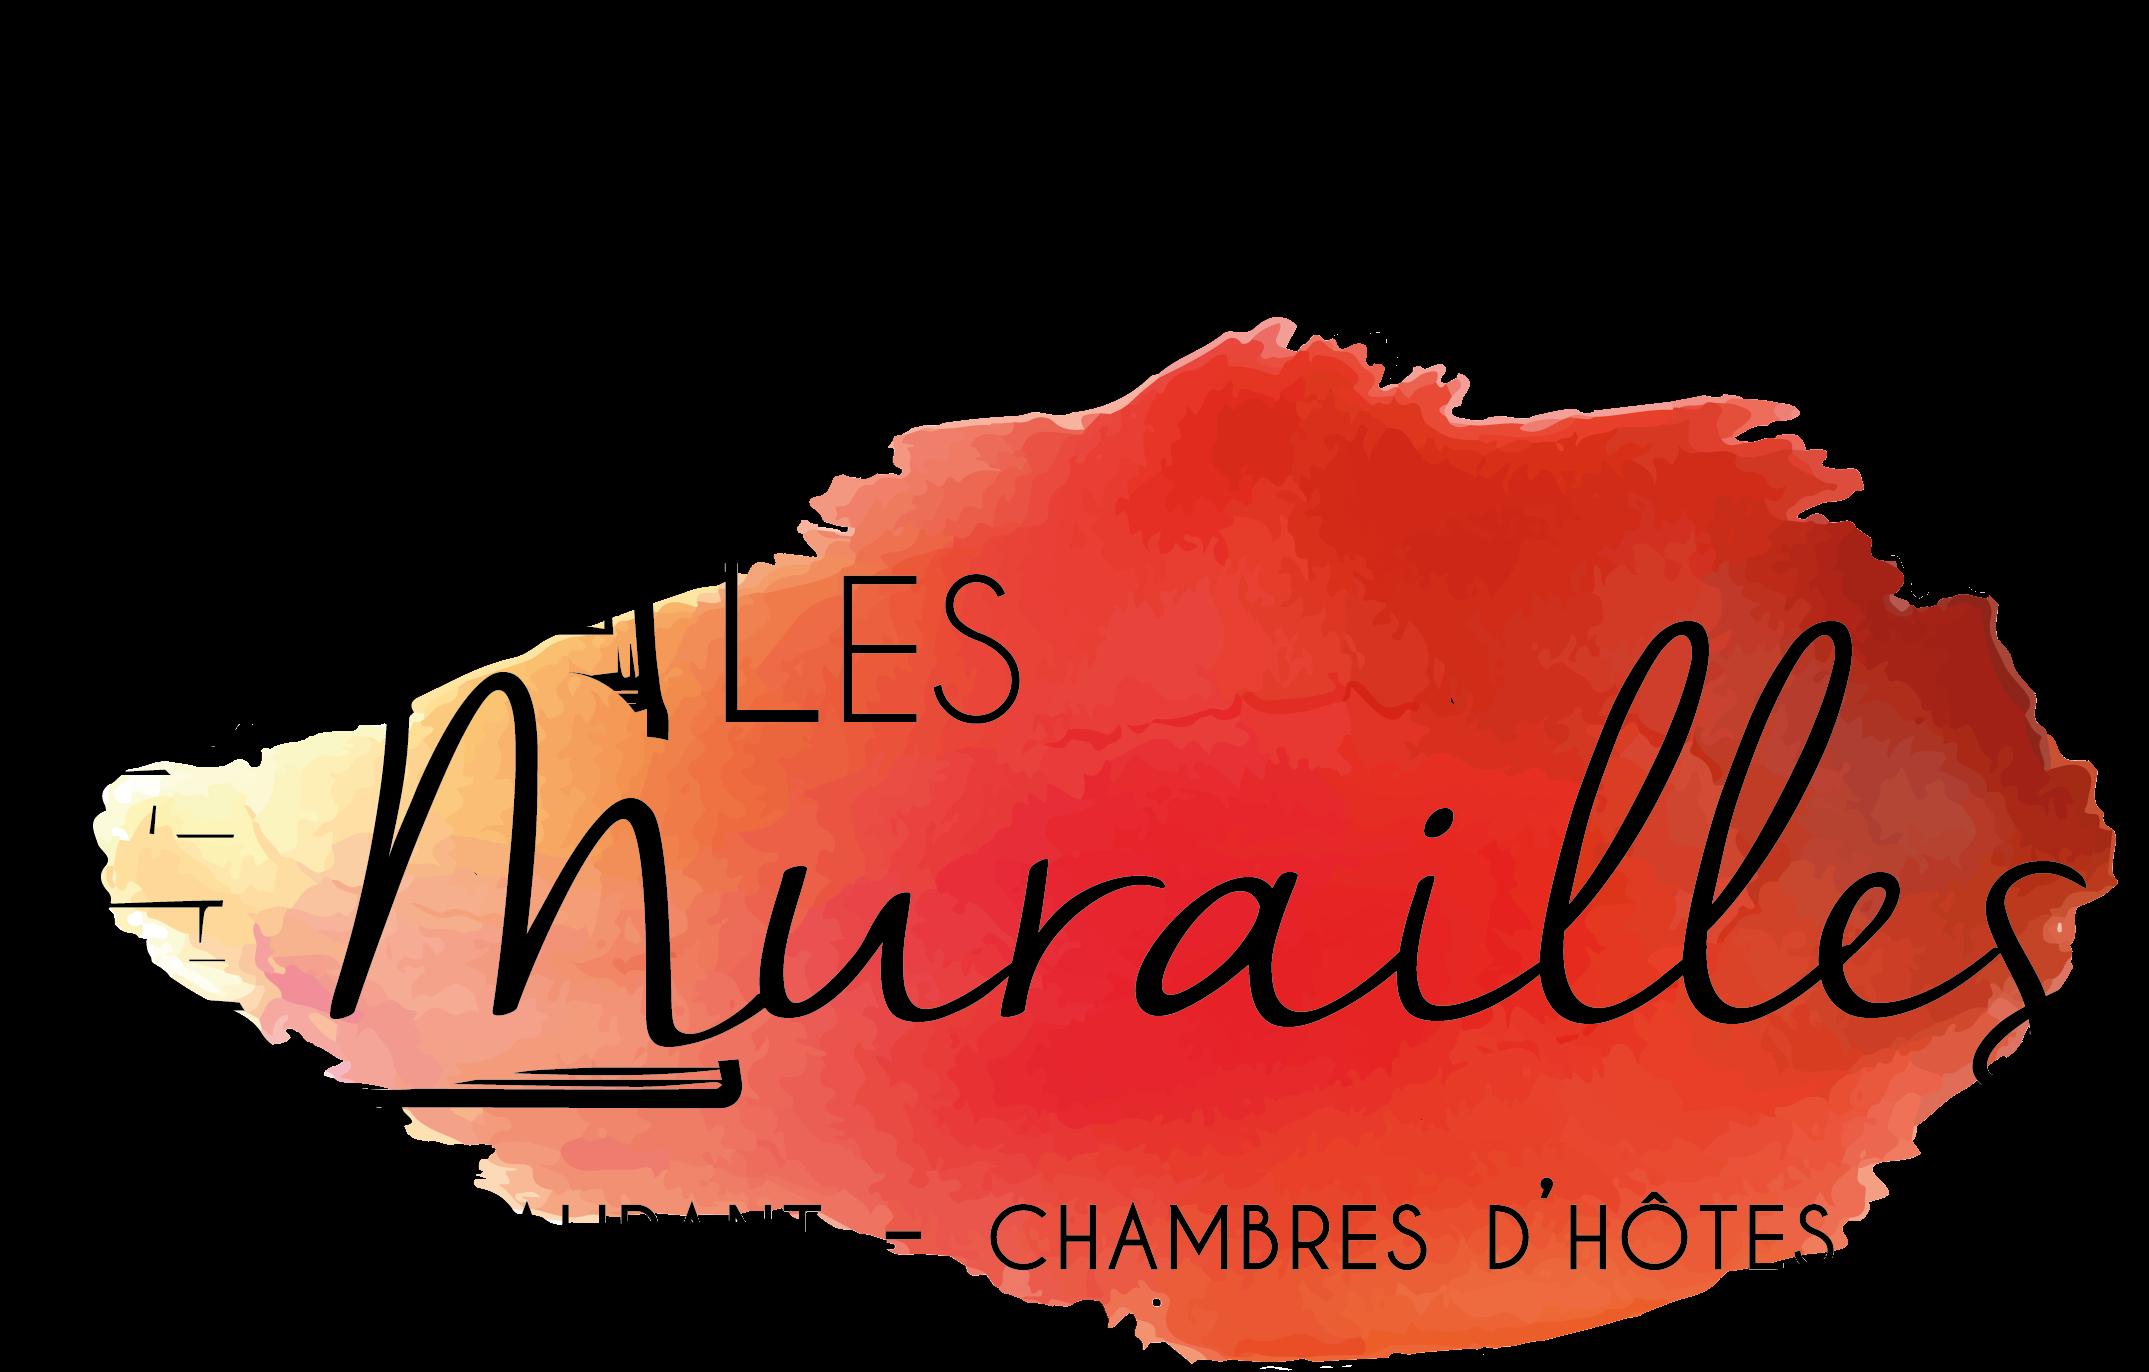 https://foh31.fr/wp-content/uploads/2018/01/Les-Murailles-1.png